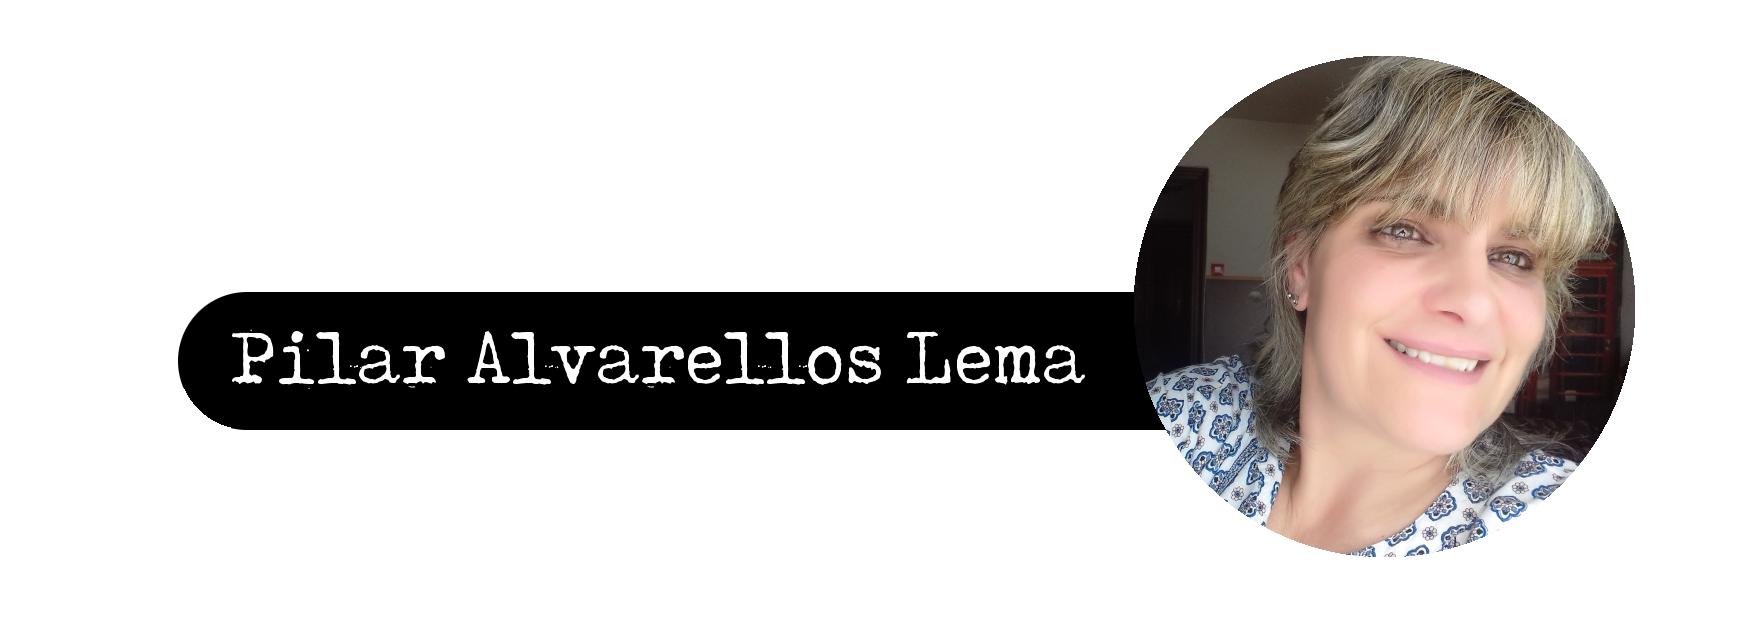 Pilar Alvarellos Lema